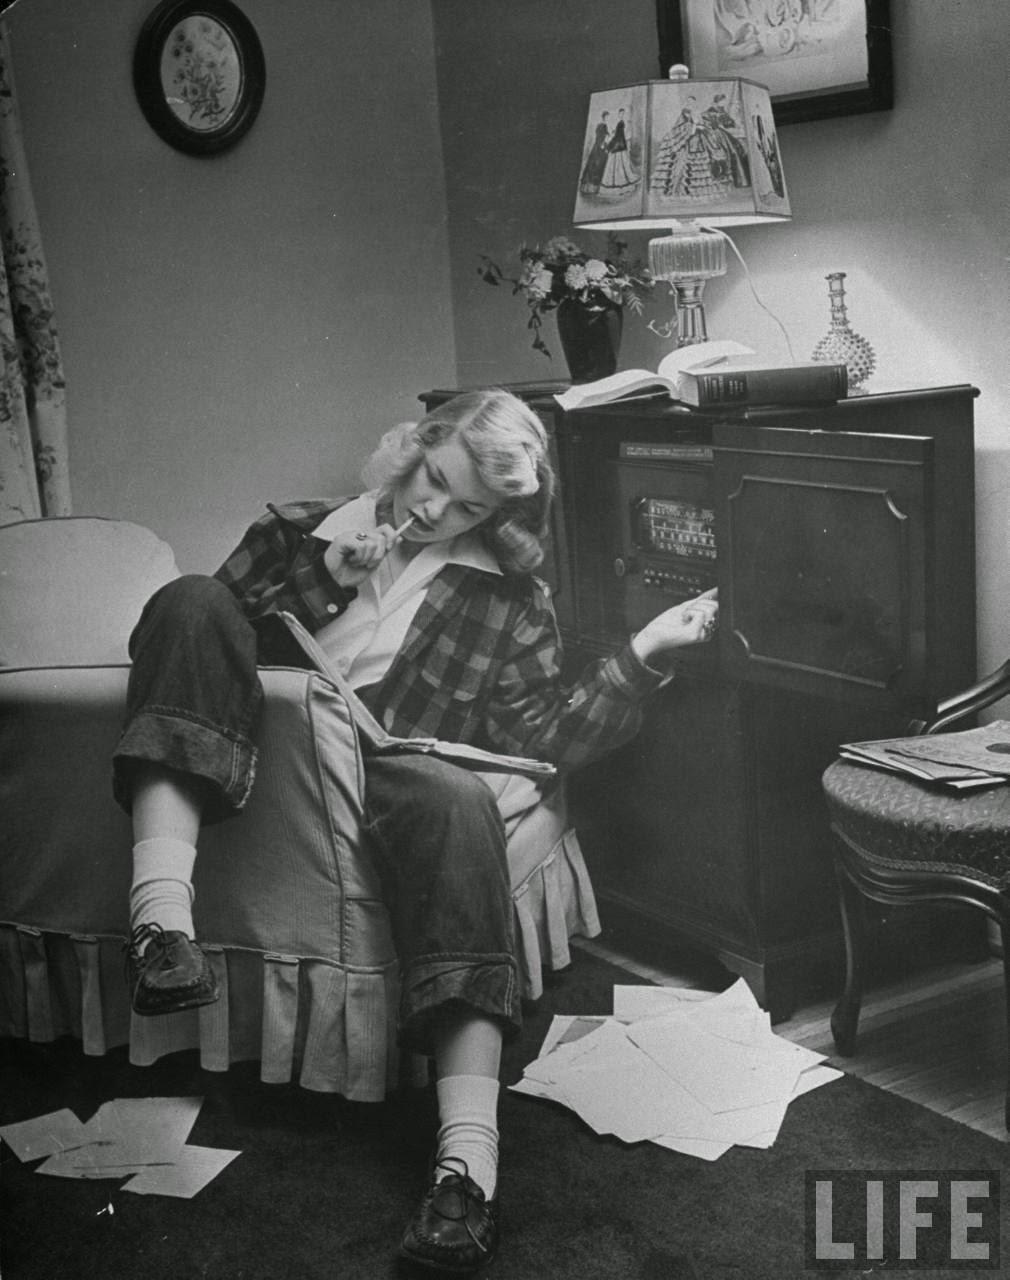 20 Interesting Vintage Photographs That Show Everyday Life